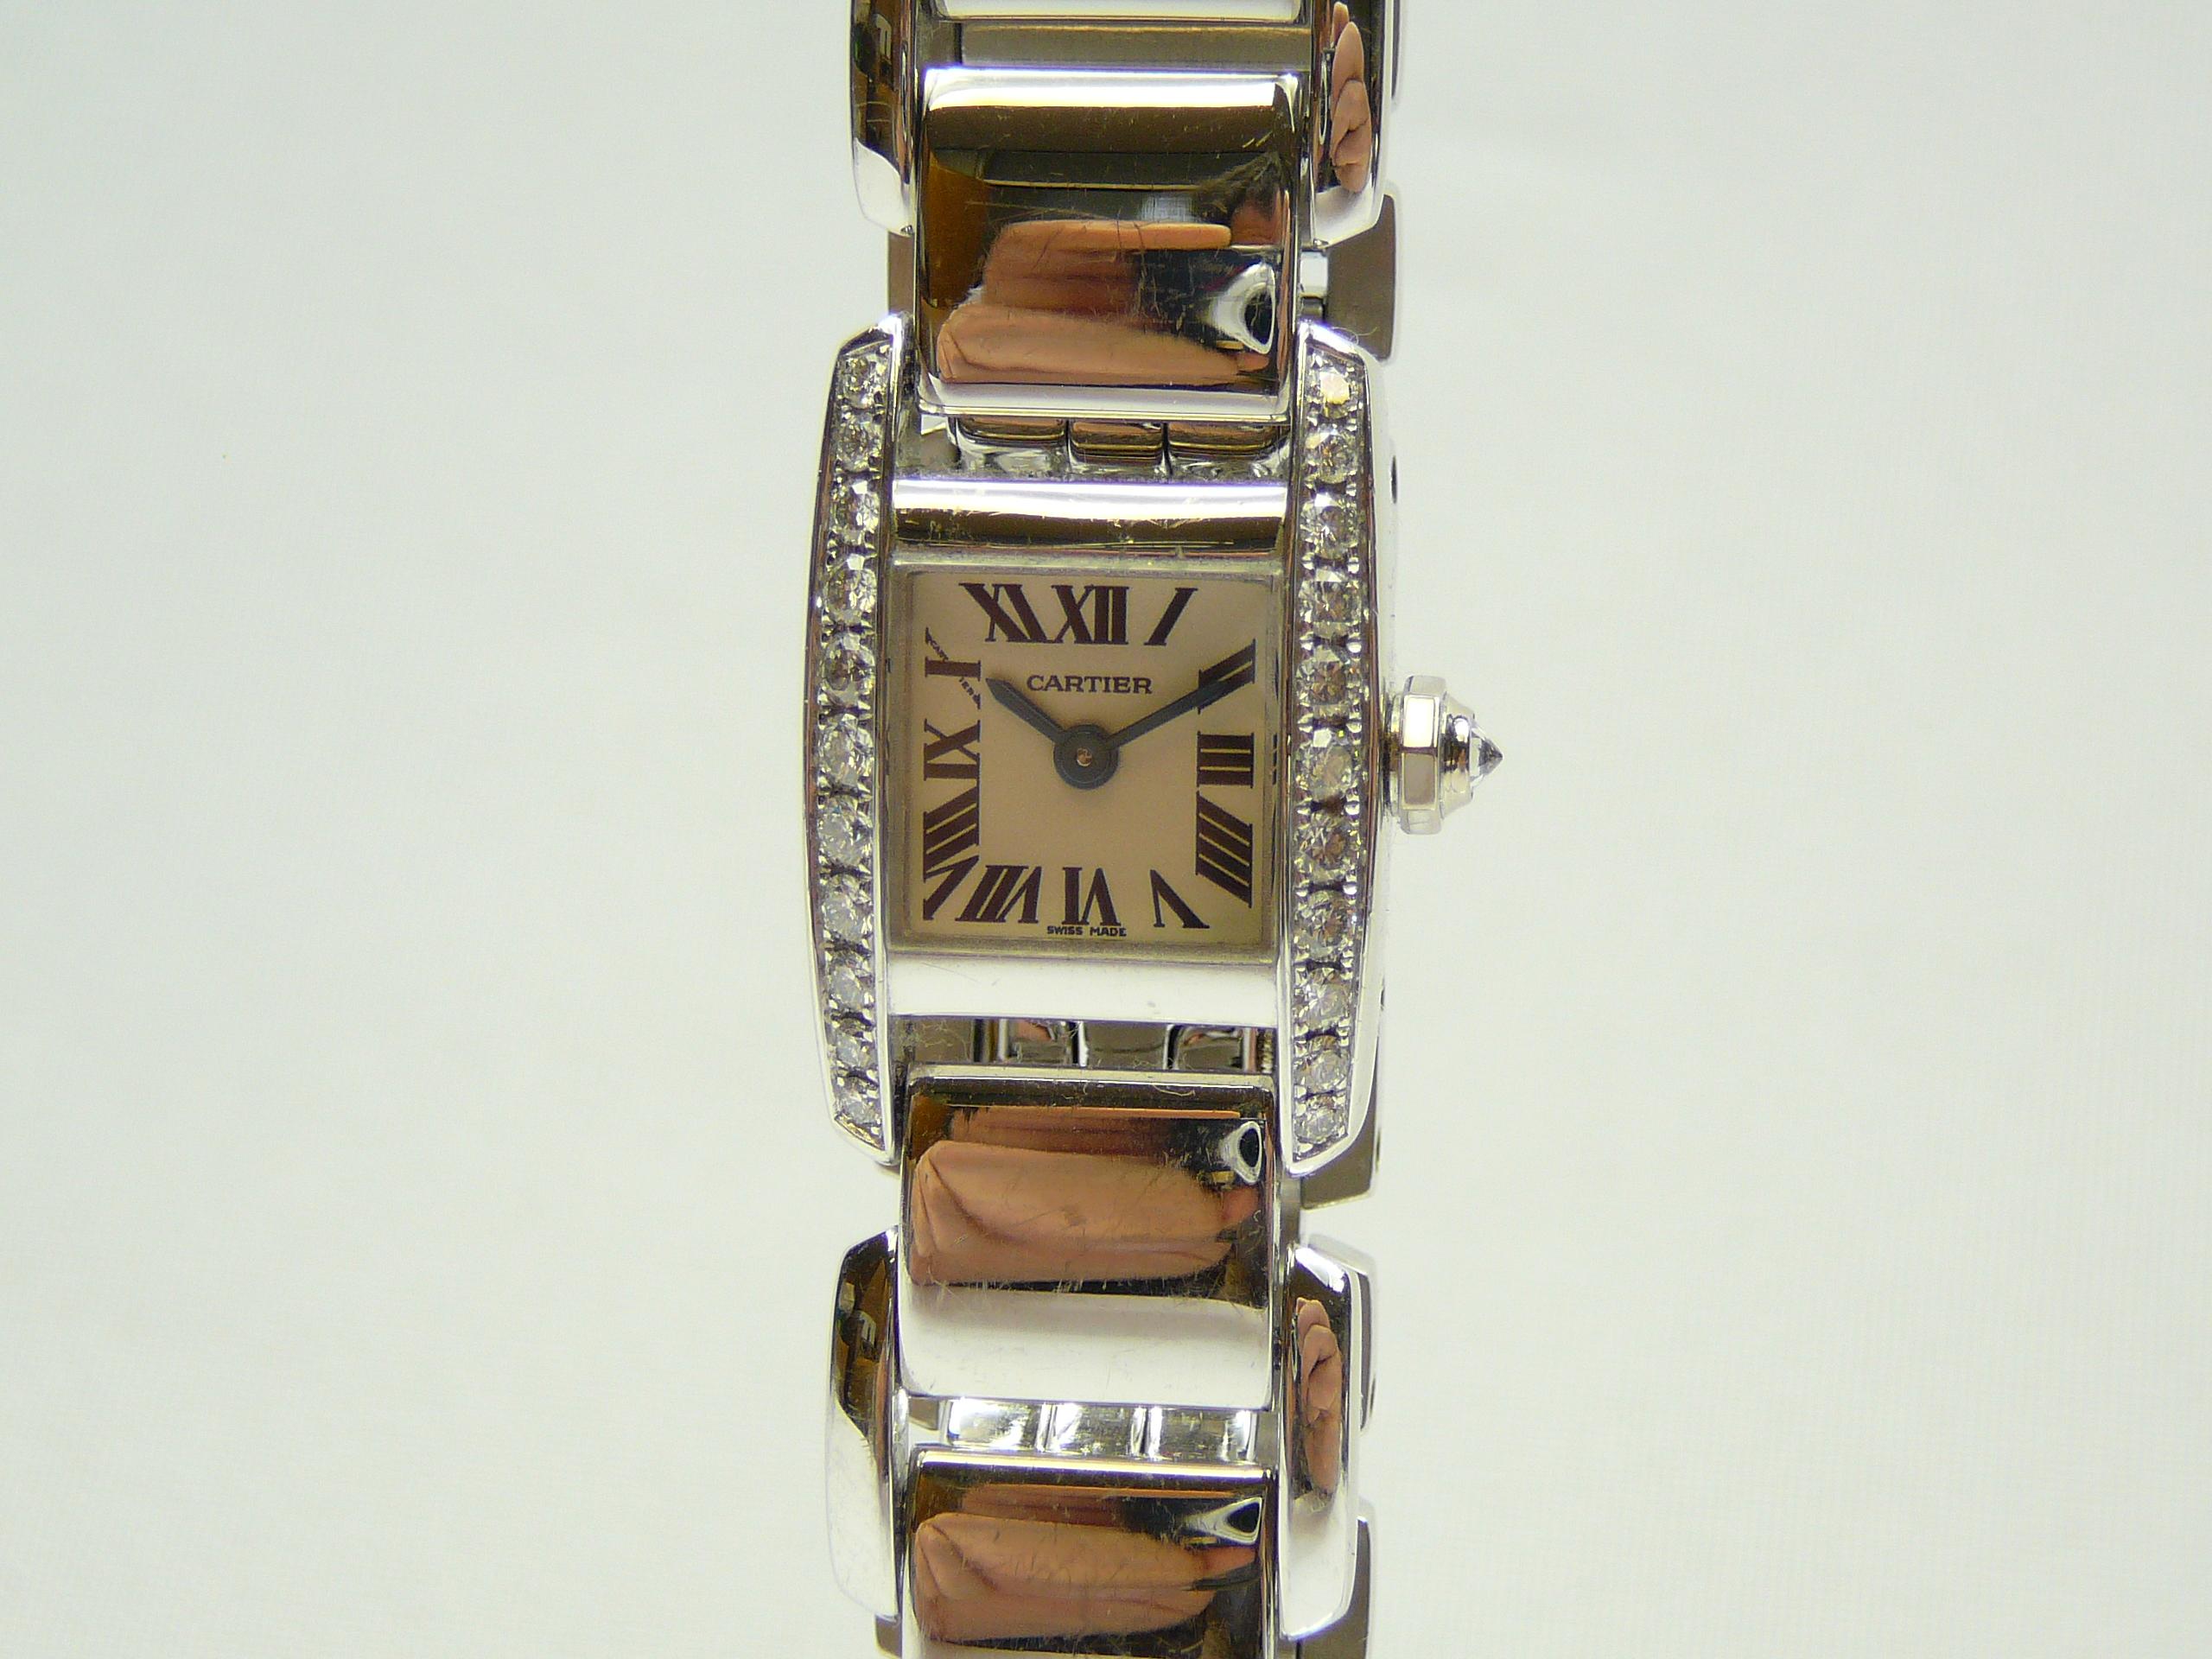 Ladies Gold Cartier Wrist Watch - Image 2 of 5